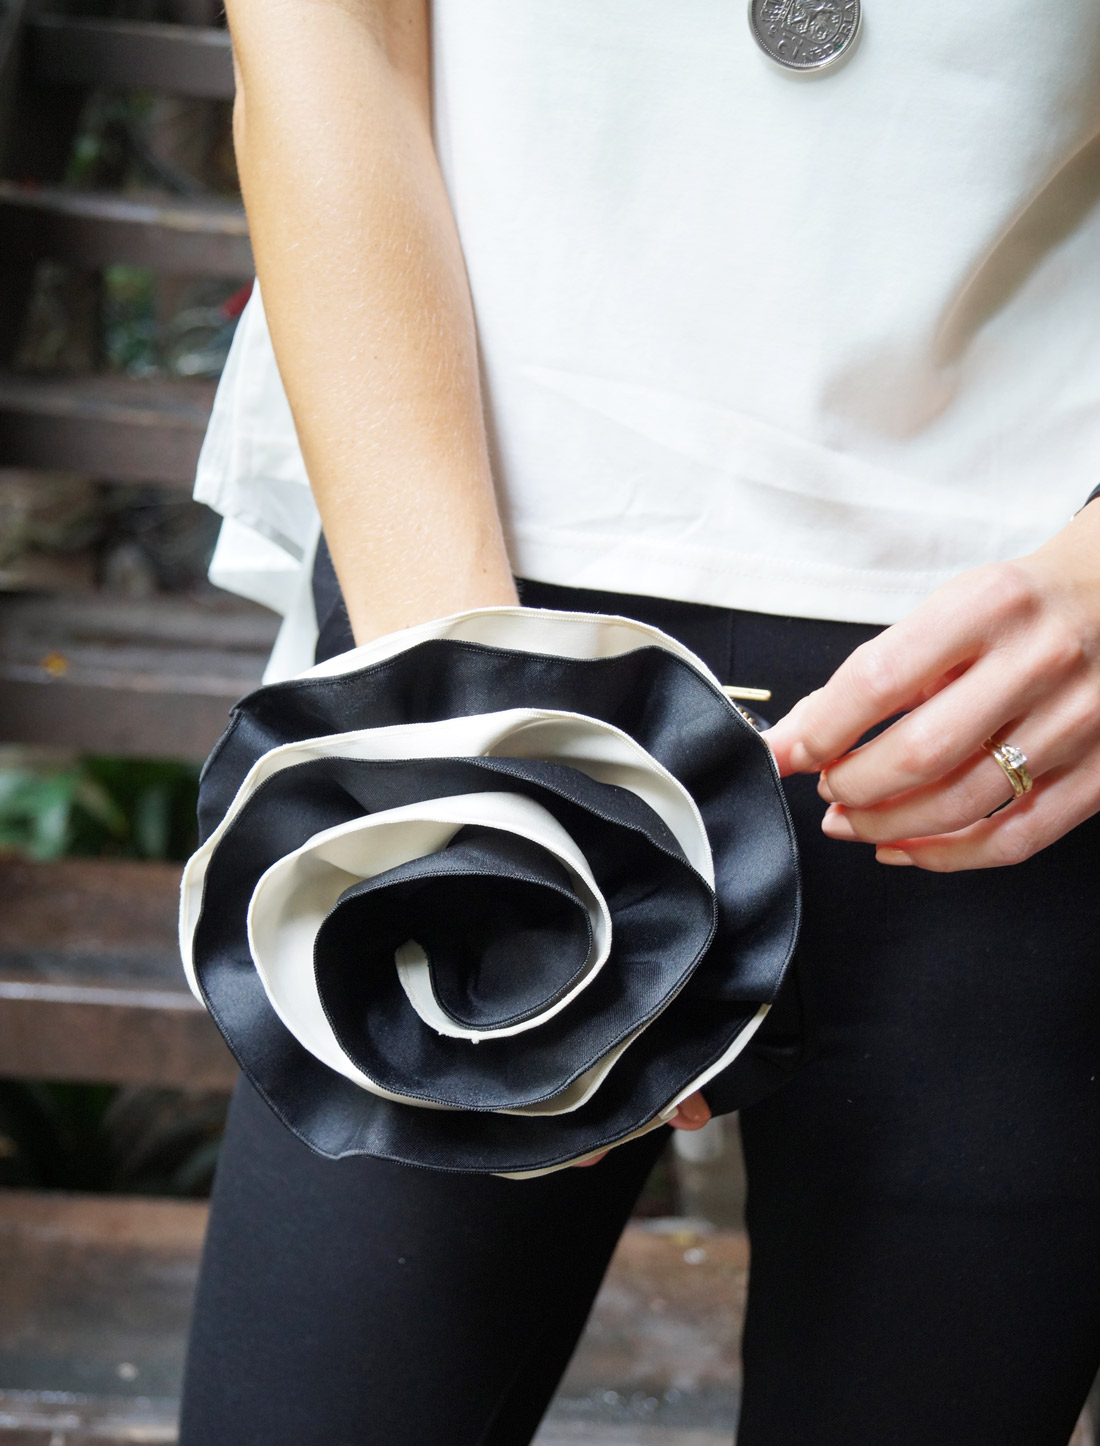 bag-at-you-fashion-blog-spanish-bag-designer-celina-martin